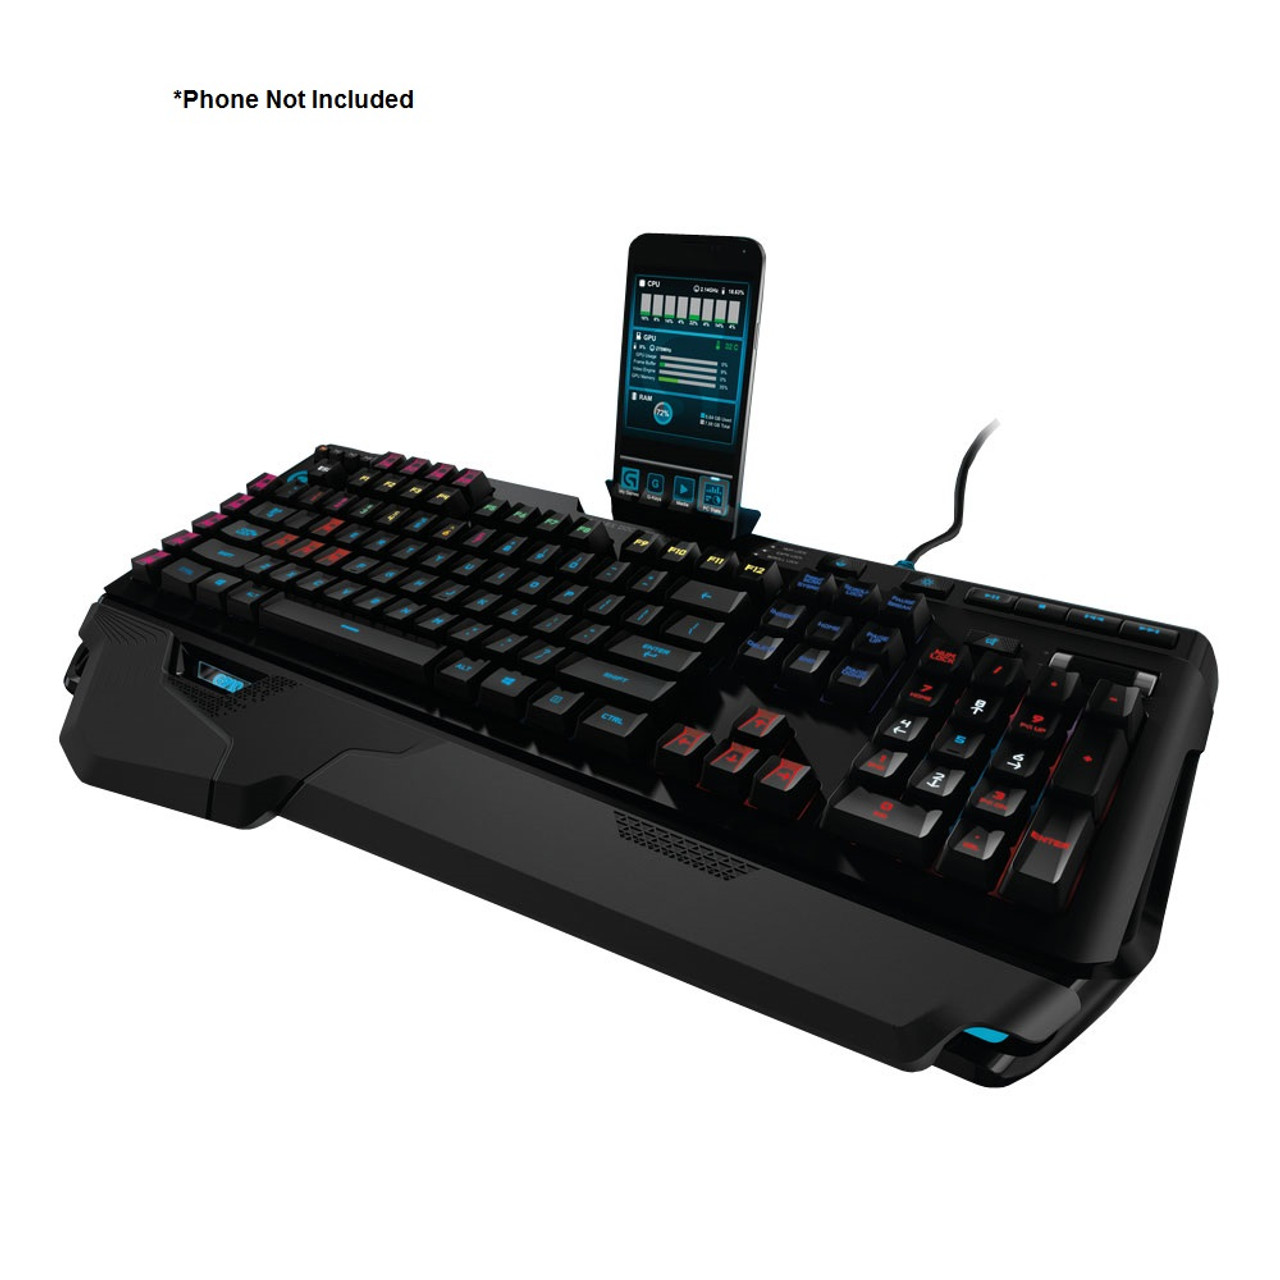 Logitech G910 Orion Spark RGB Mechanical Gaming Keyboard (920-006385) - Refurbished